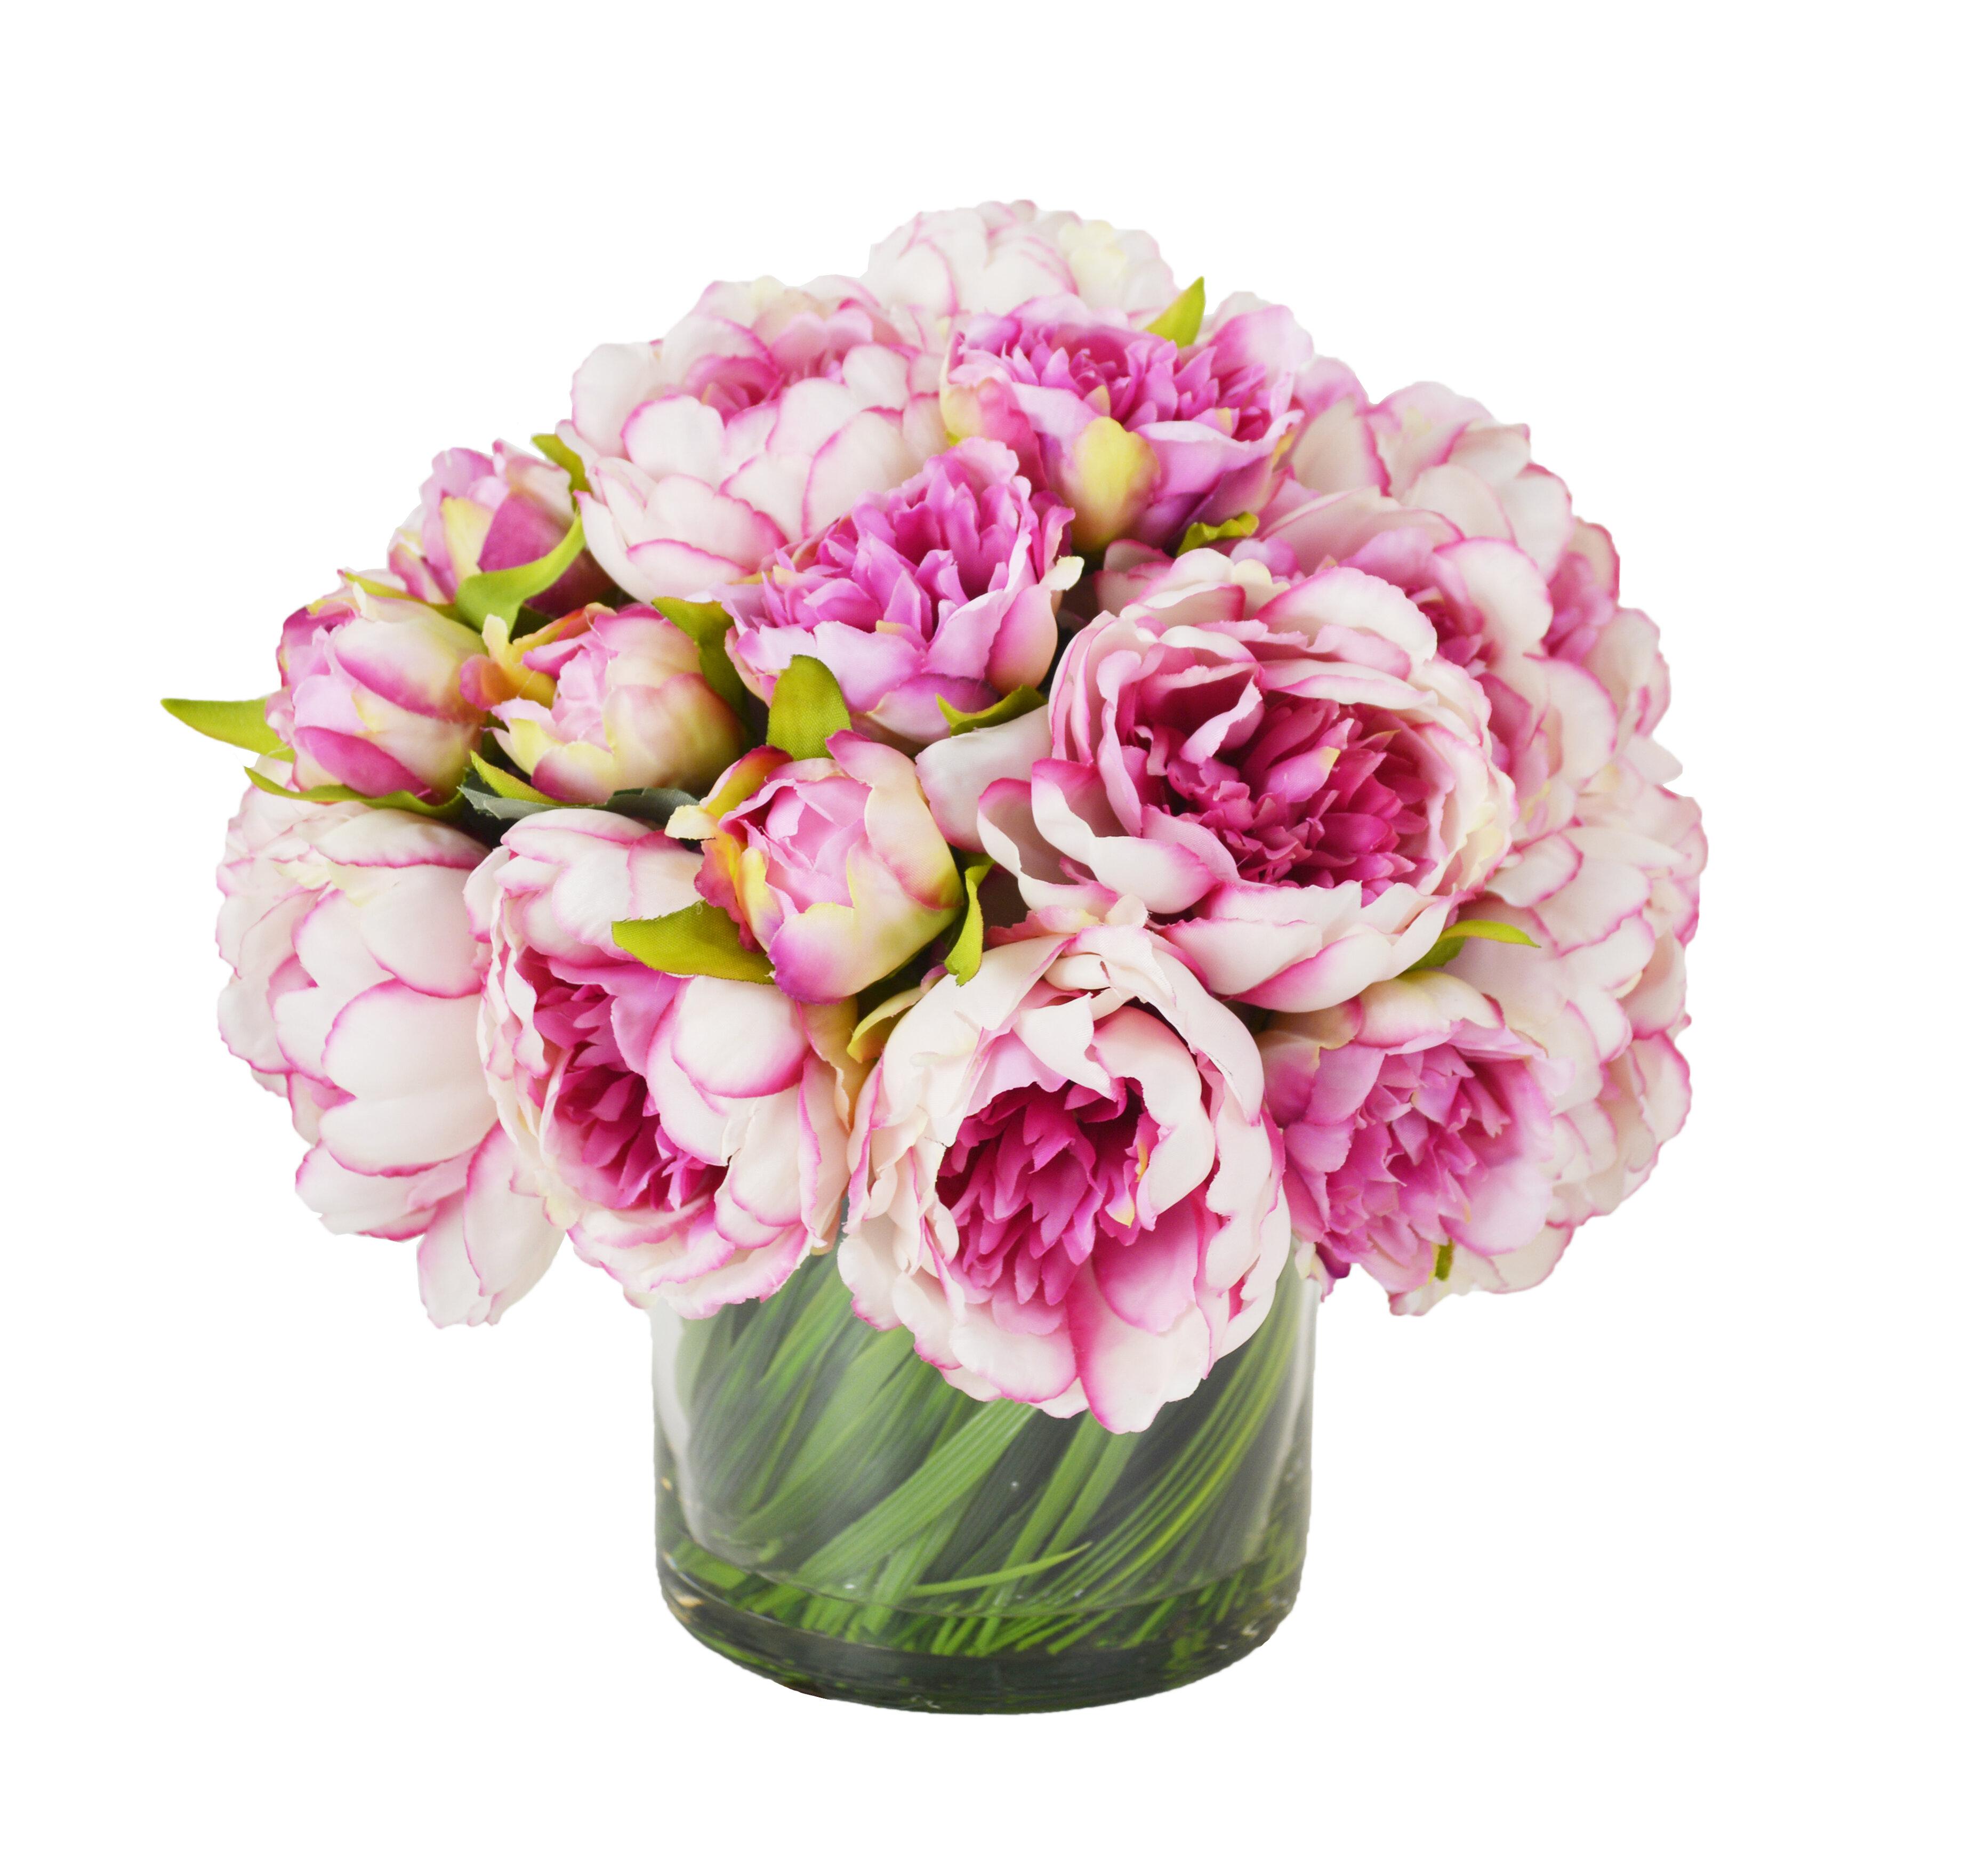 Willa arlo interiors faux magenta pink peony floral arrangement willa arlo interiors faux magenta pink peony floral arrangement in glass vase reviews wayfair reviewsmspy